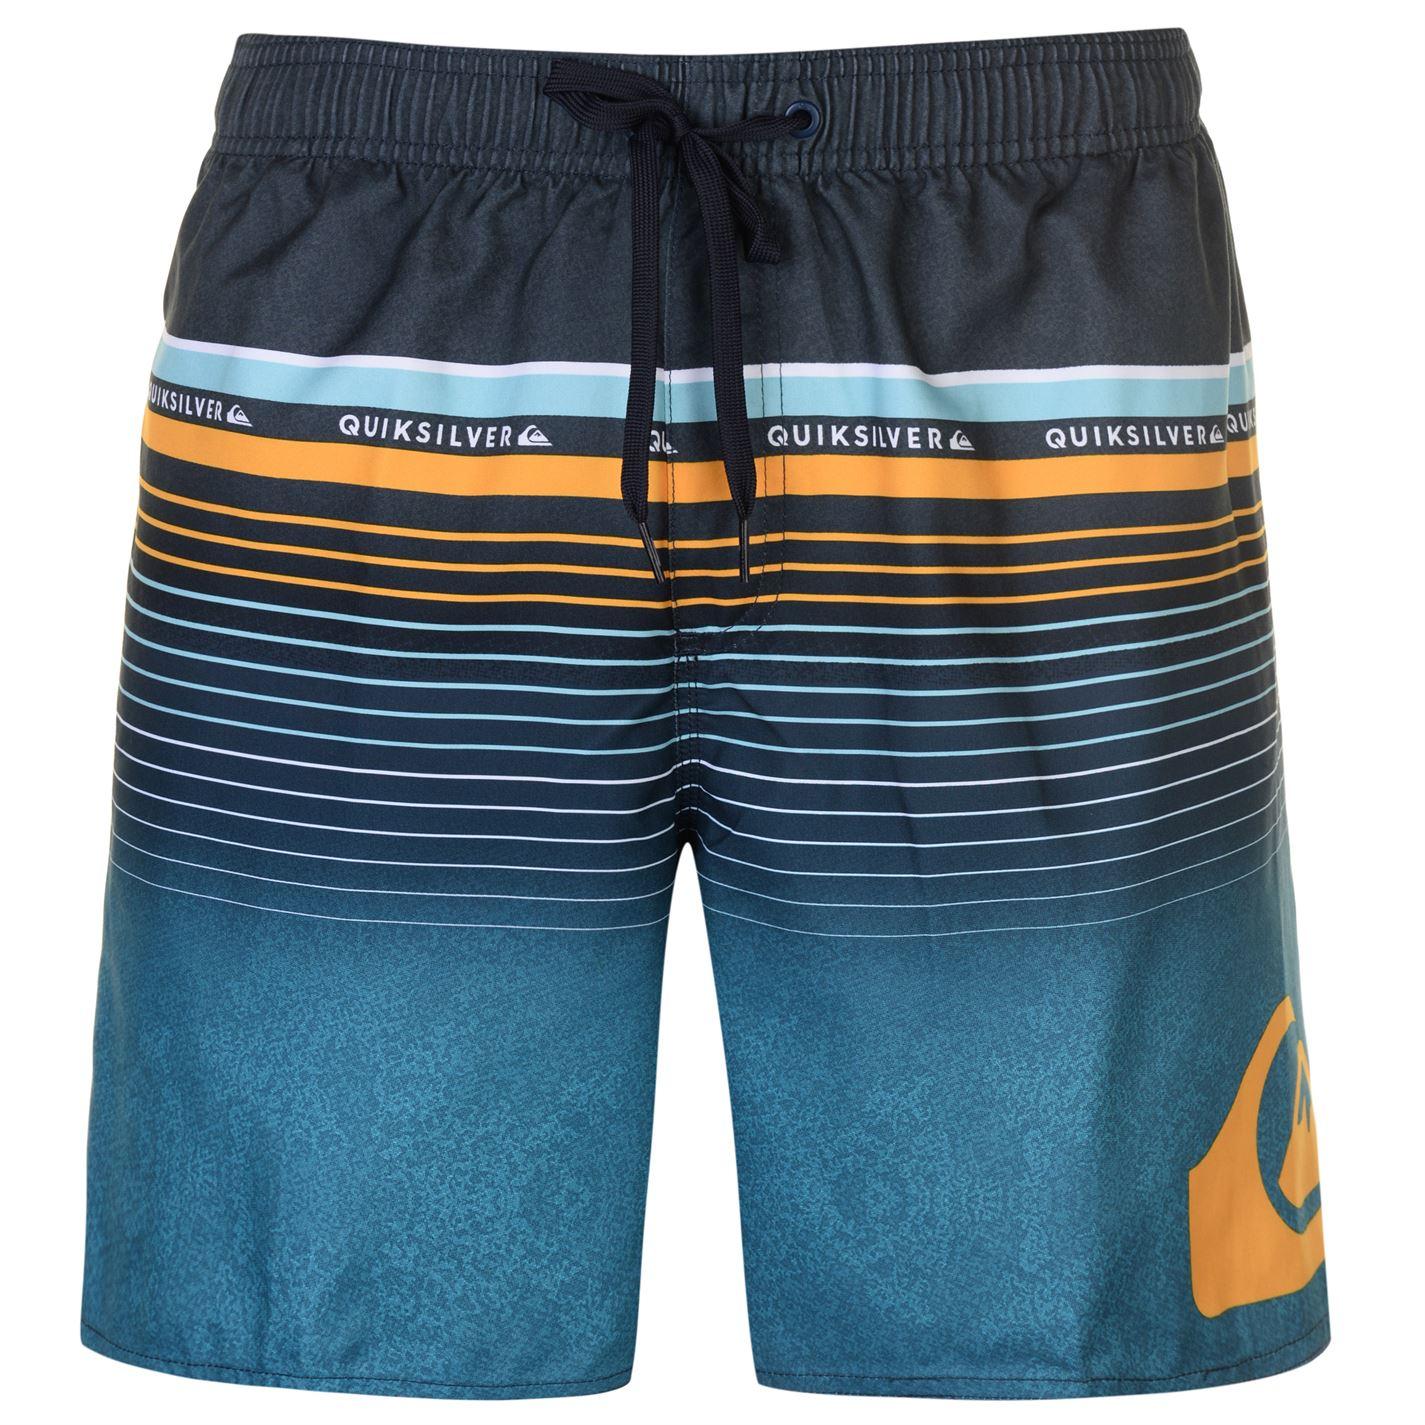 Quiksilver Continuum Board Shorts Mens